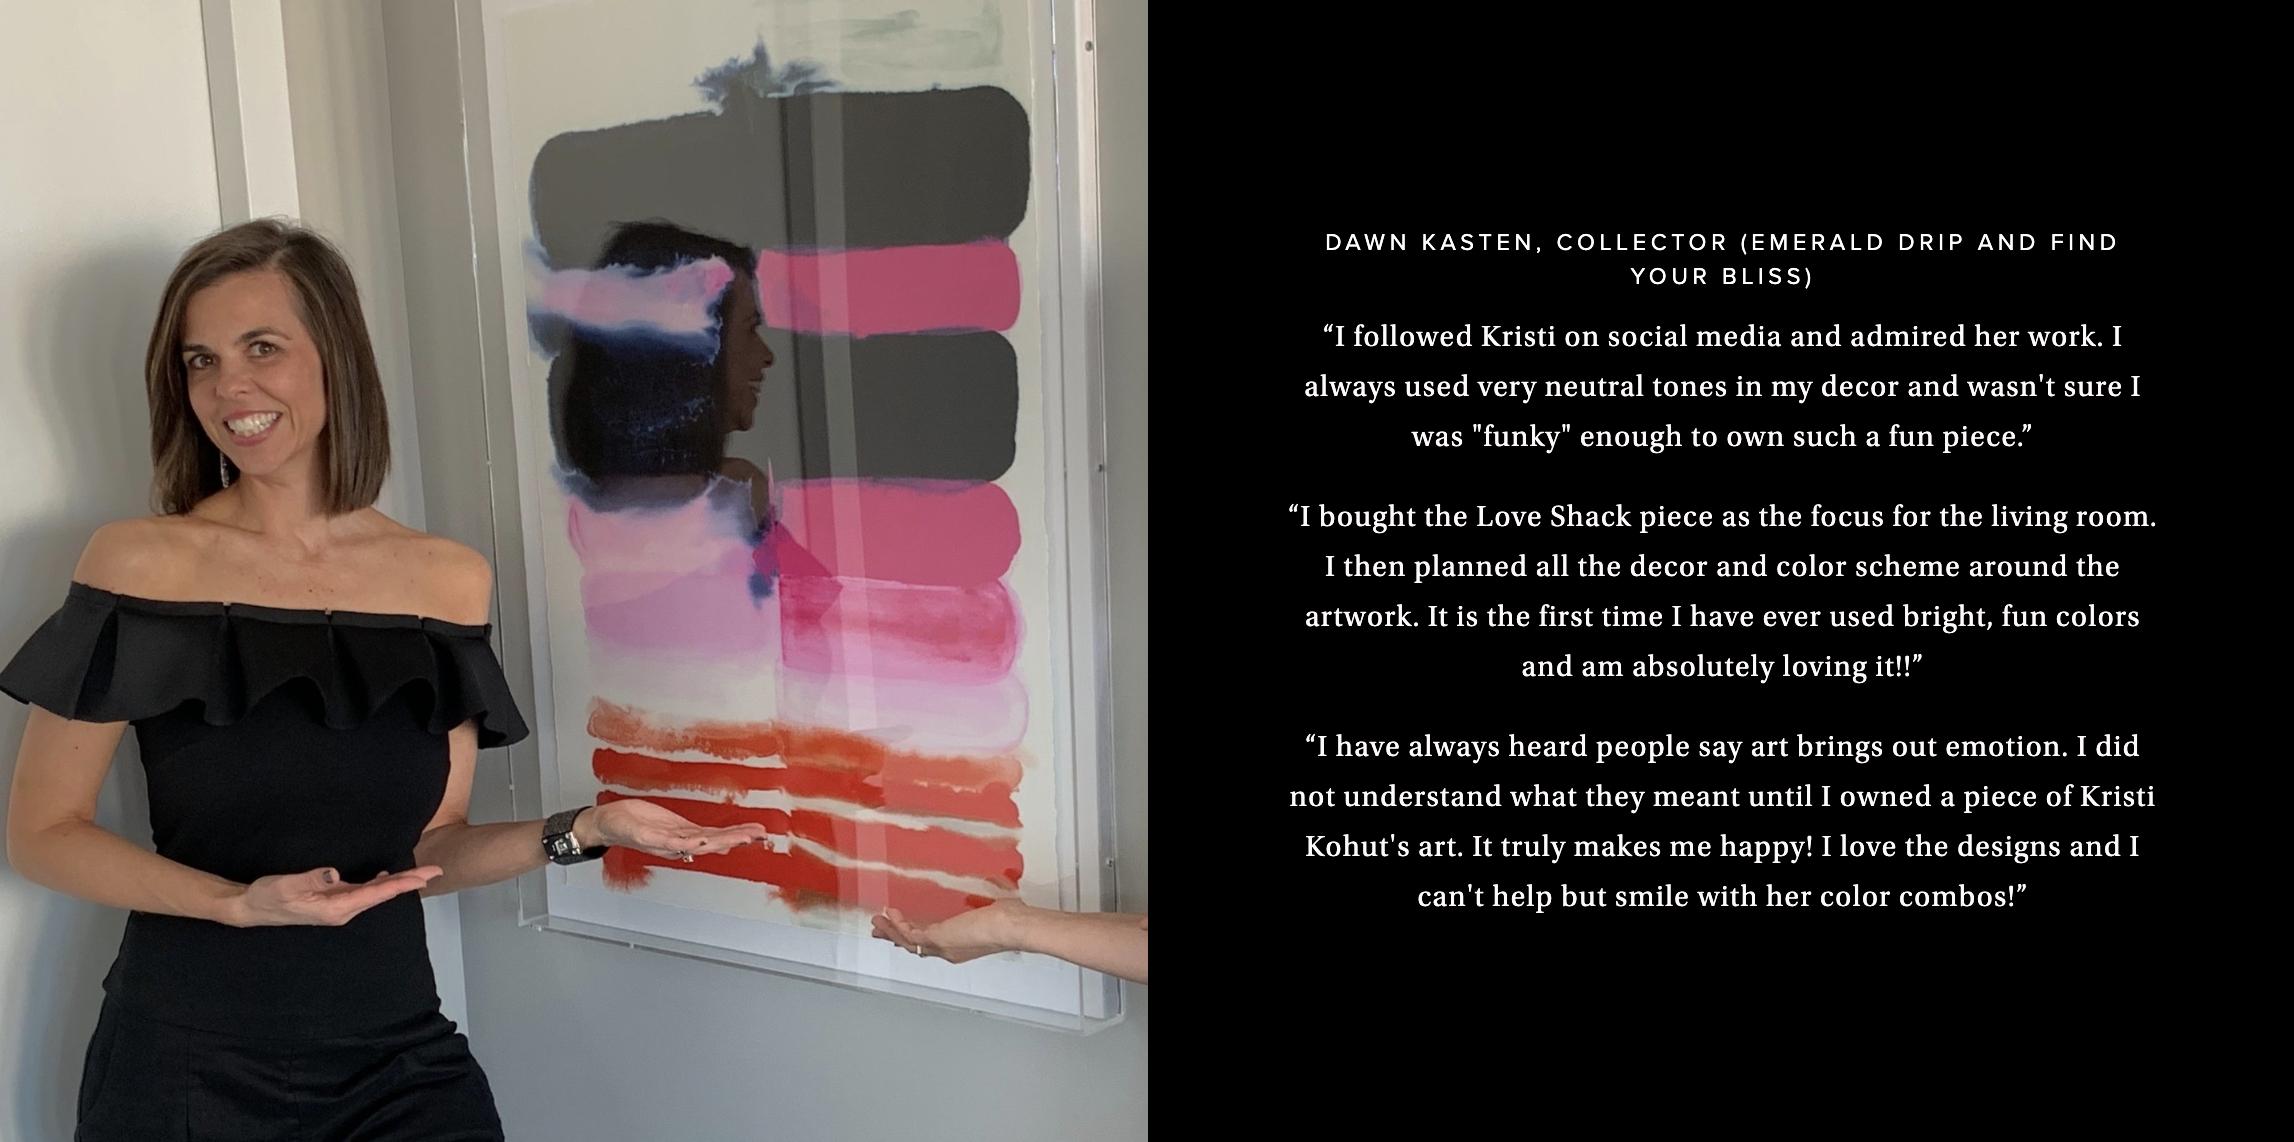 Kristi-Kohut-fine-art-in-homes-collector-colorful-art.jpg